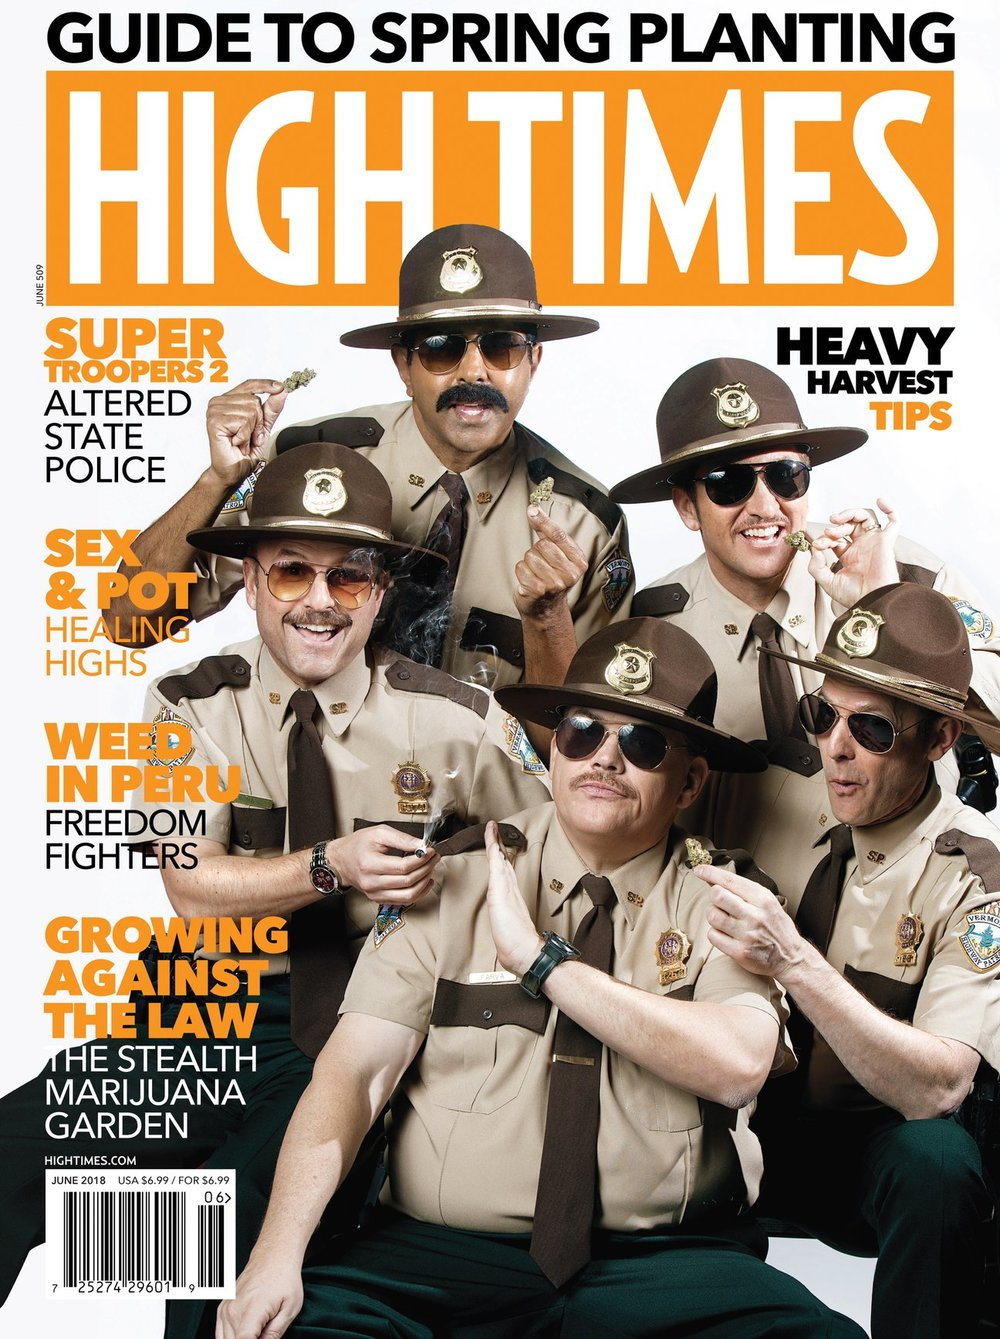 Super+Troopers+Cover.jpg